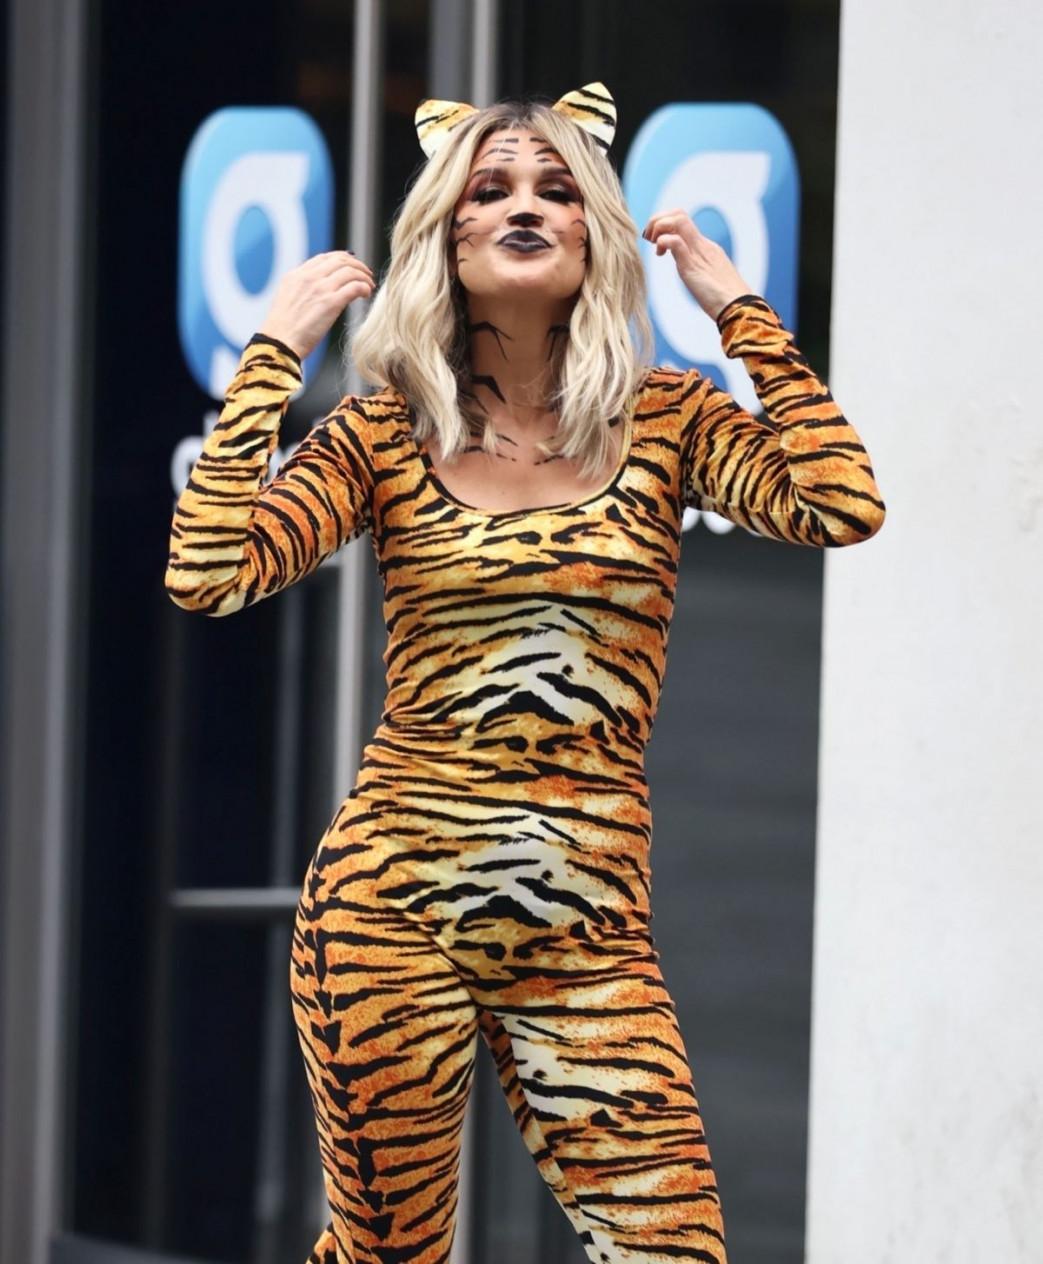 Ashley-Roberts-Stunning-in-Tiger-Catsuit-10.jpg